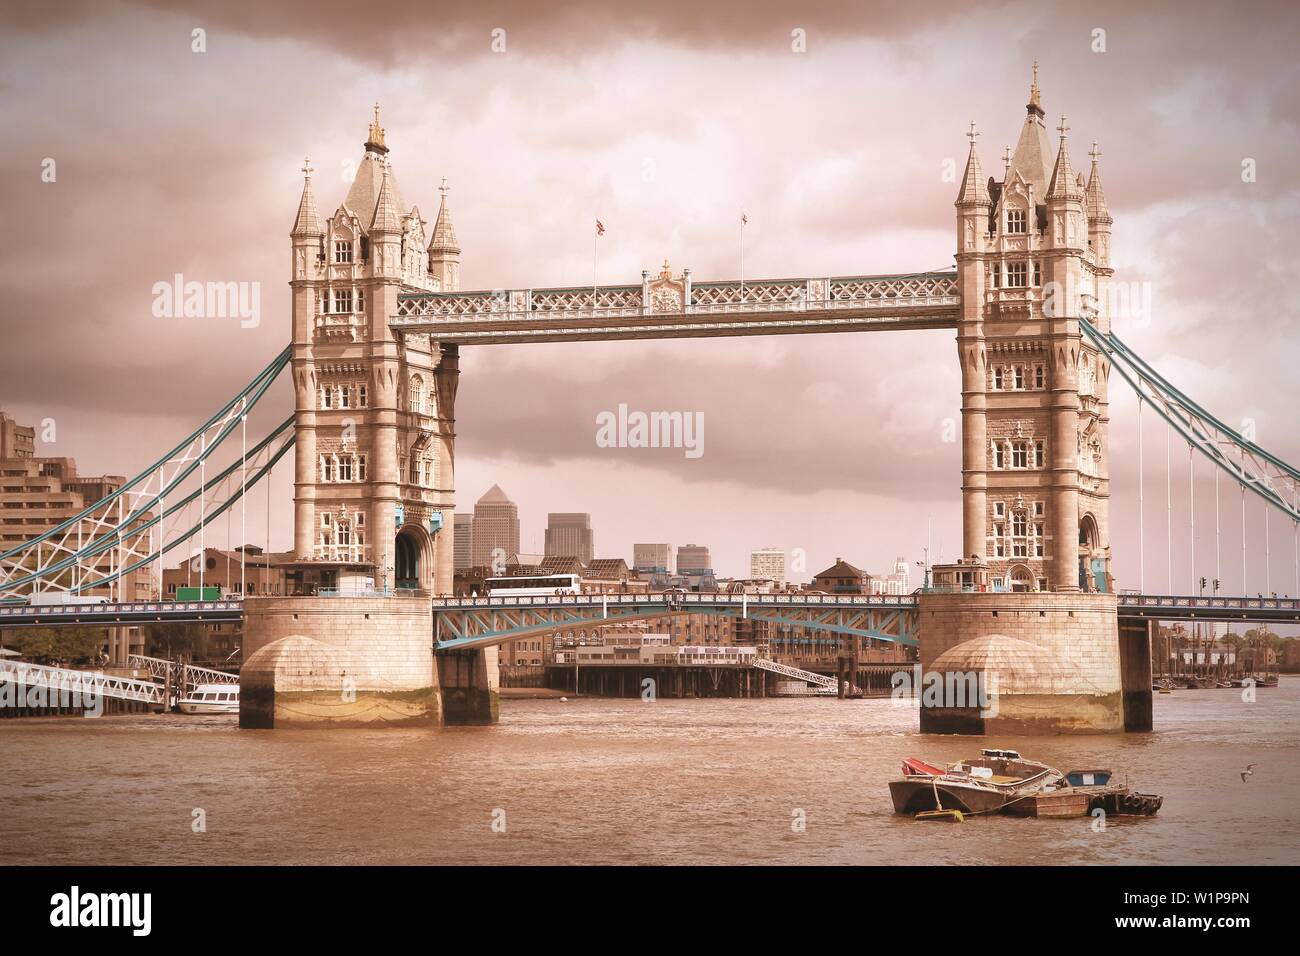 London, UK - Tower Bridge. Old landmark. Cross processed vintage photo filtered tone. - Stock Image